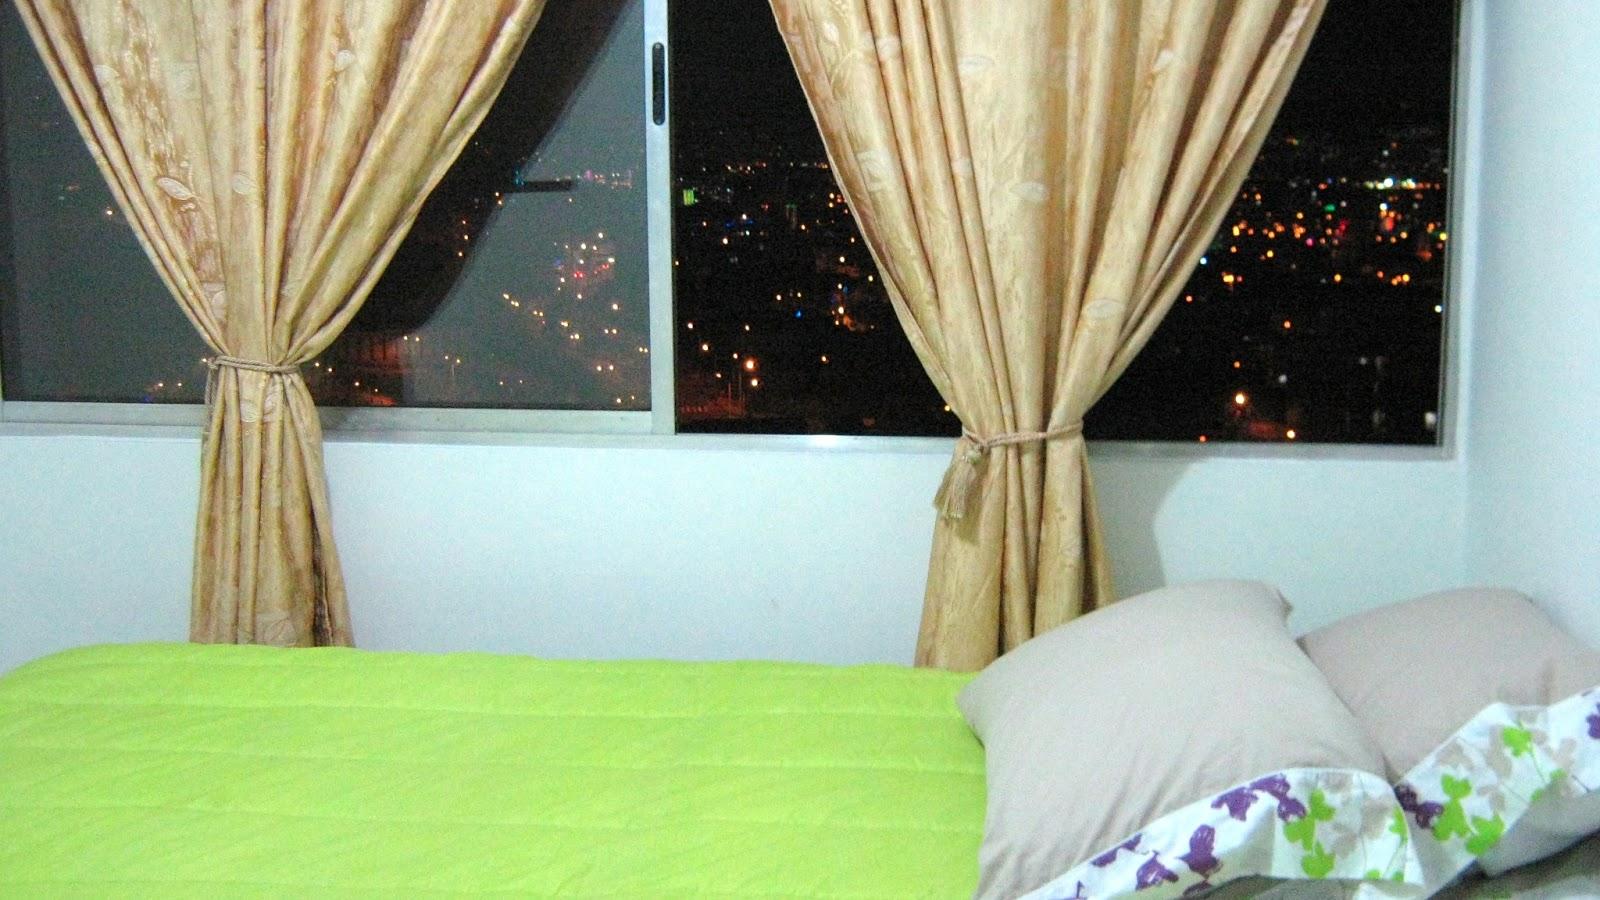 Amoblados bbb apartamentos amoblados en medell n por dias for Apartamentos baratos en sevilla por dias